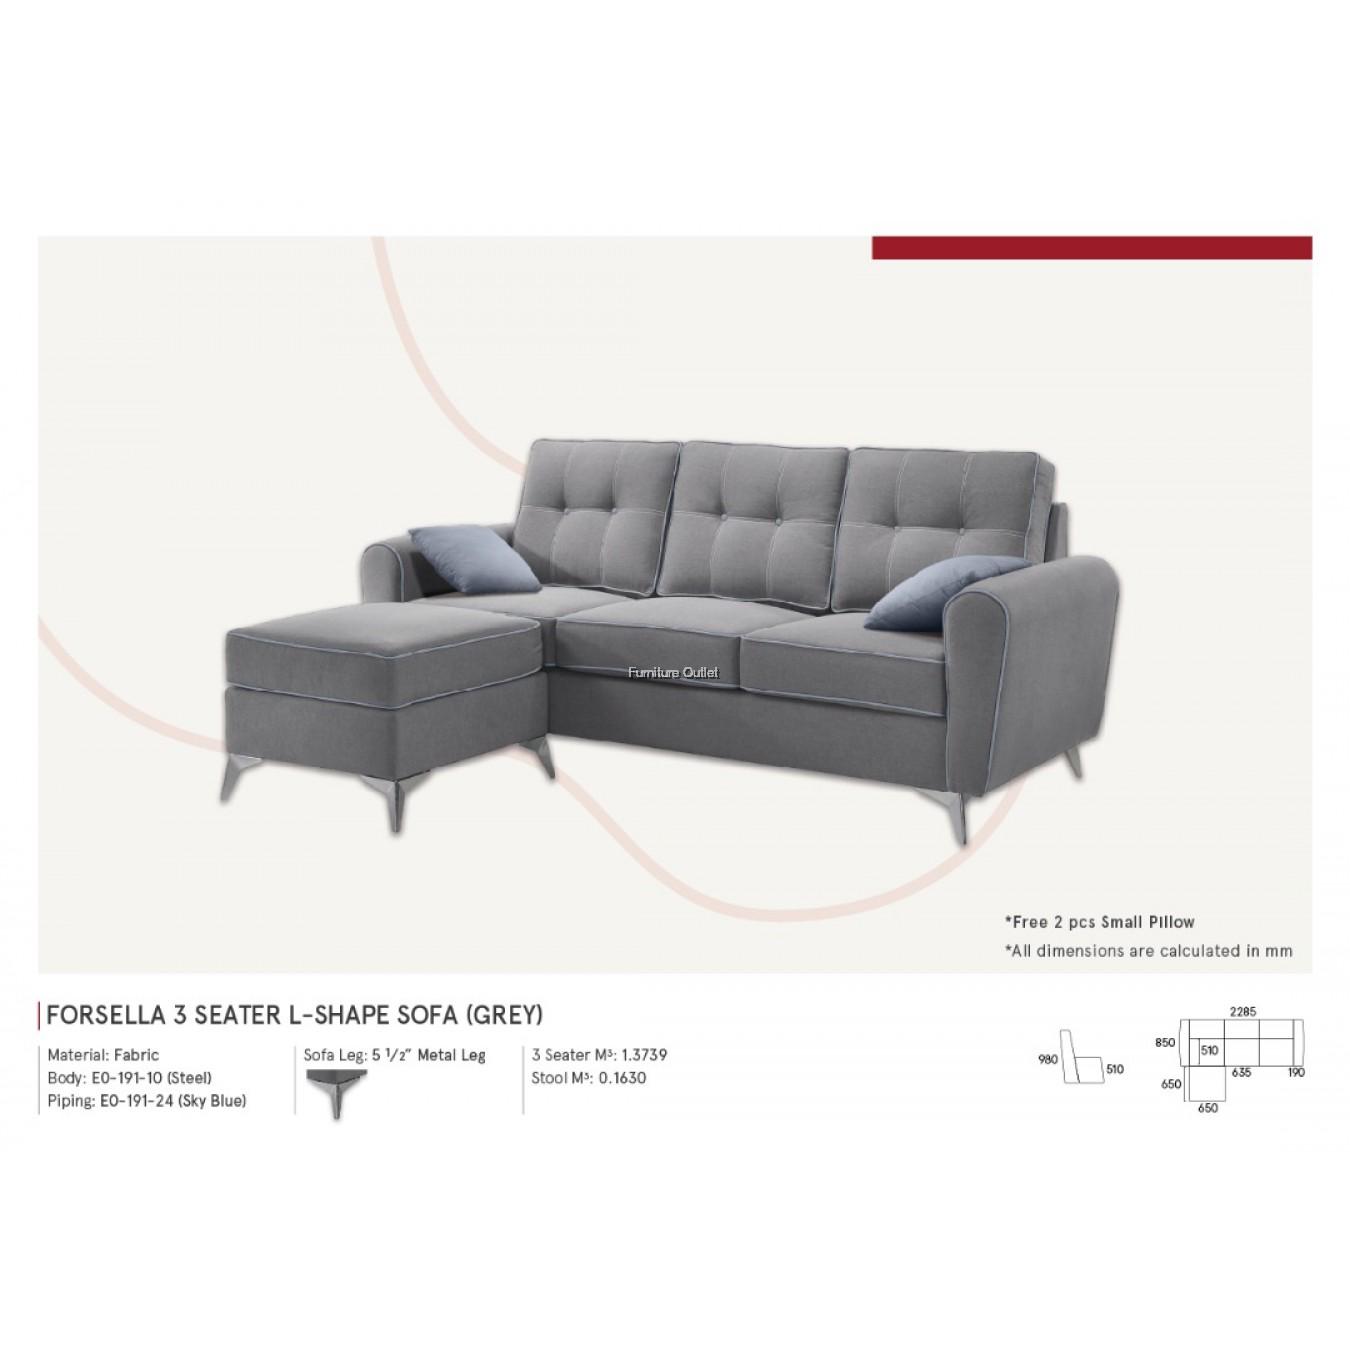 Forsella L-Shape 3 Seater - 2 color